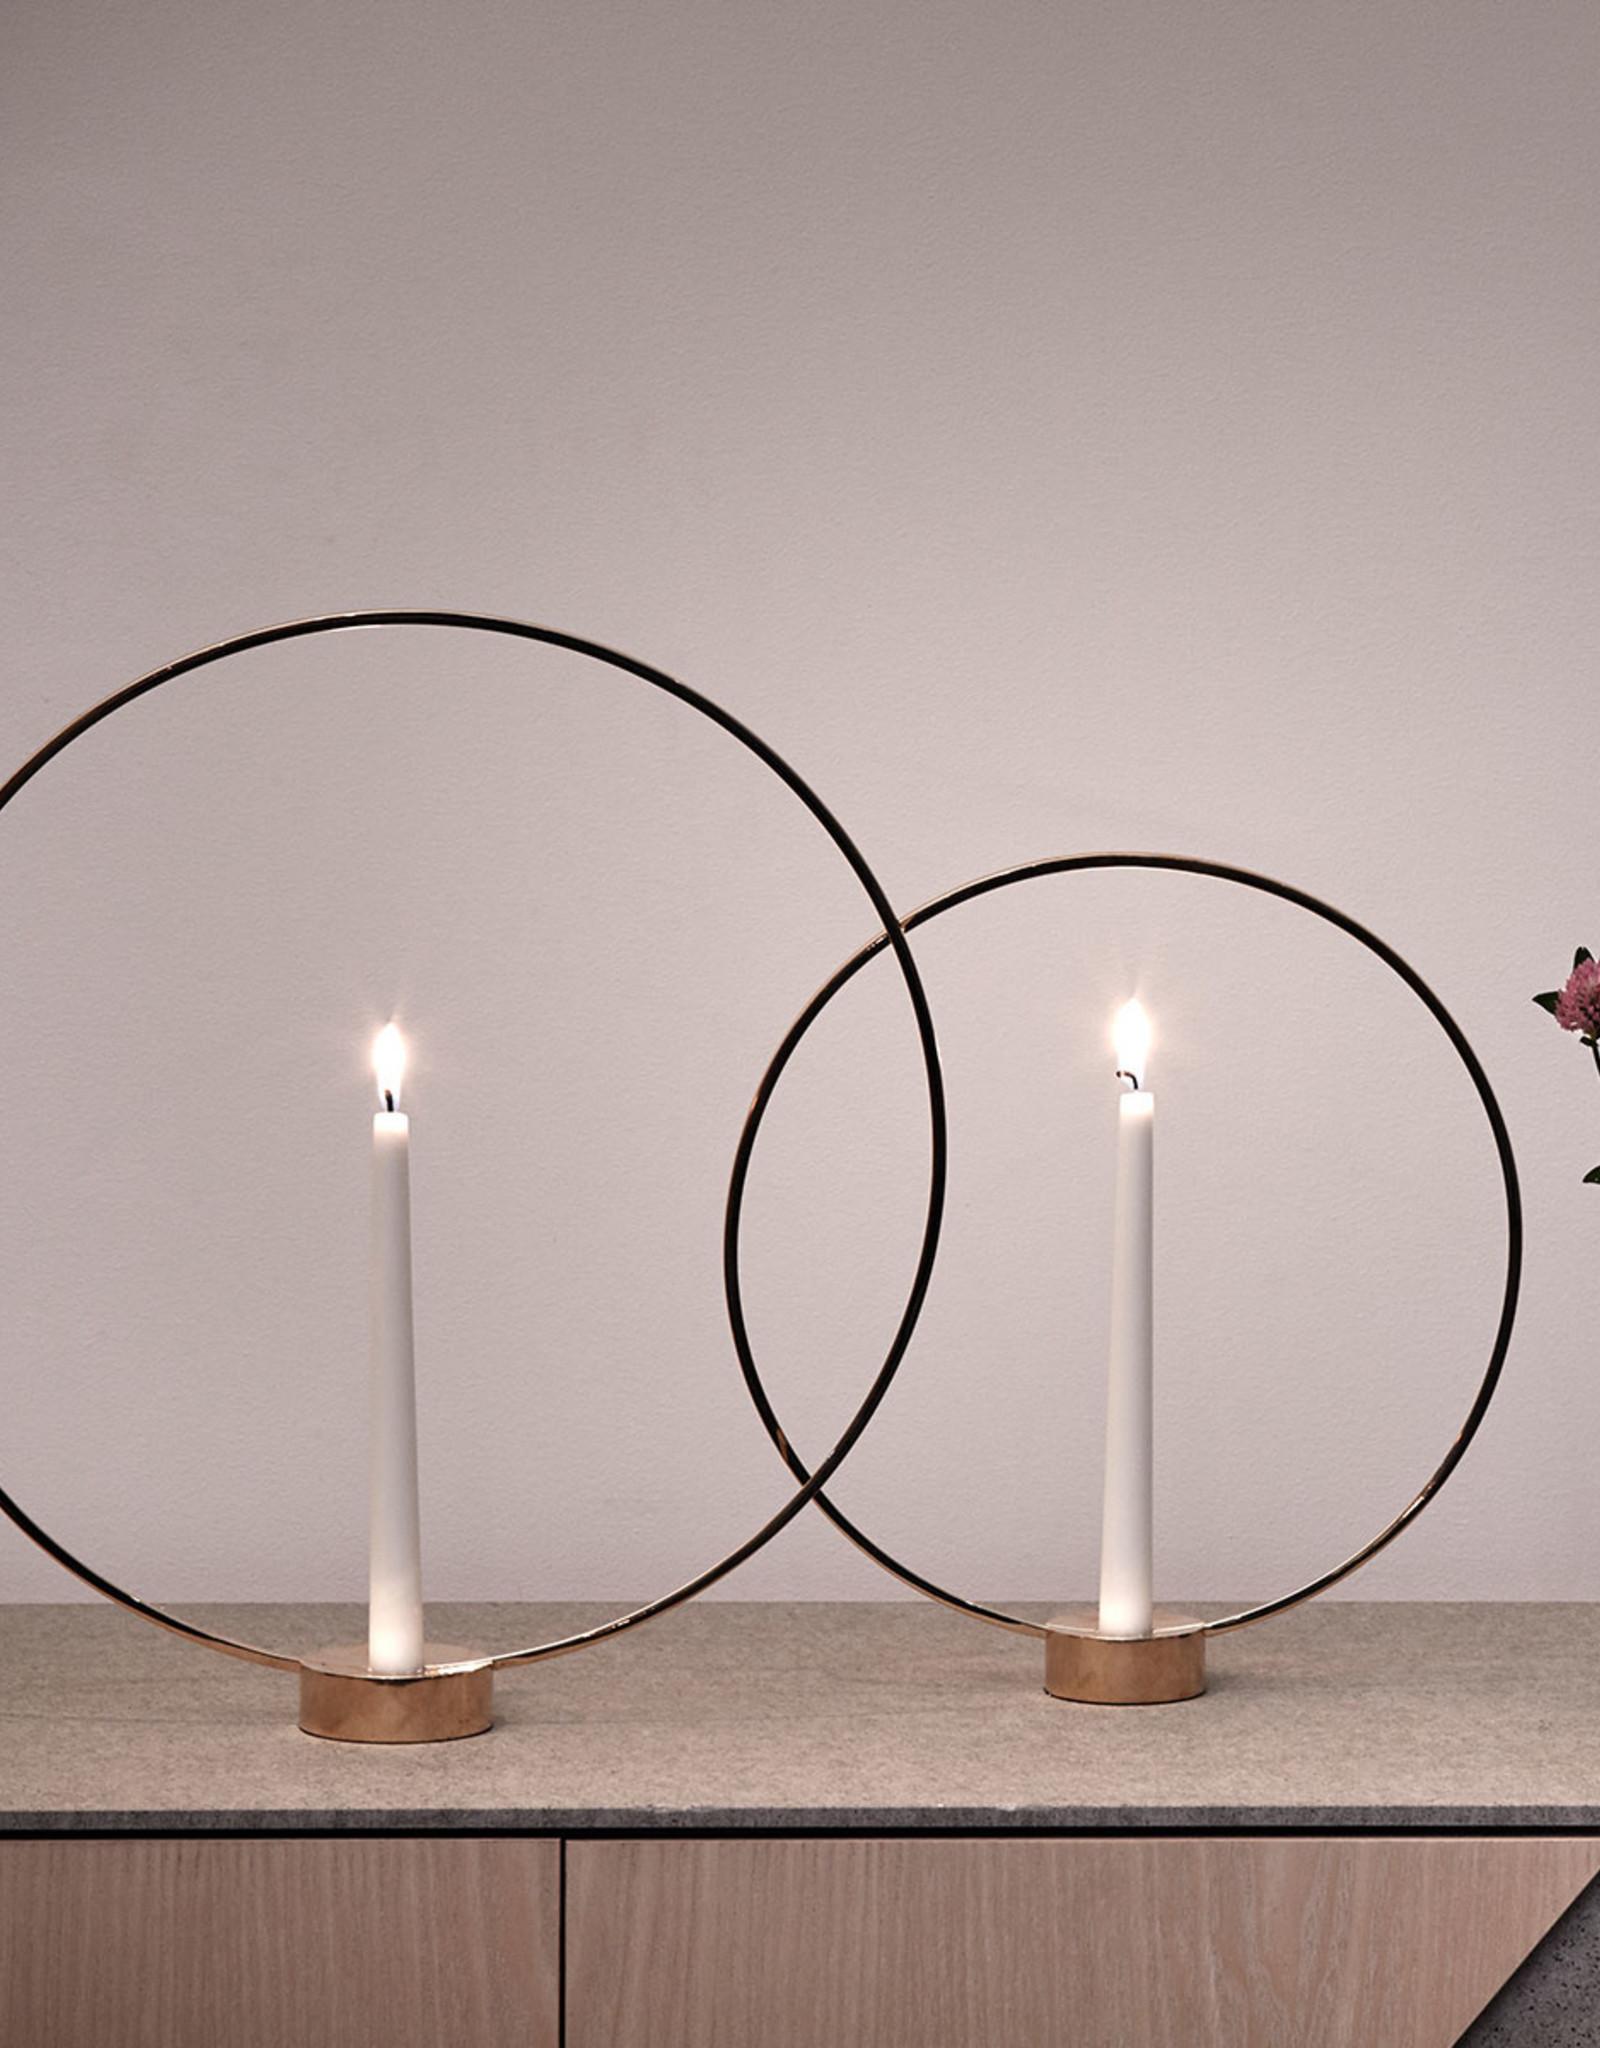 Gloria Ring by Mats Broberg and Johan Ridderstrale | Brass | S